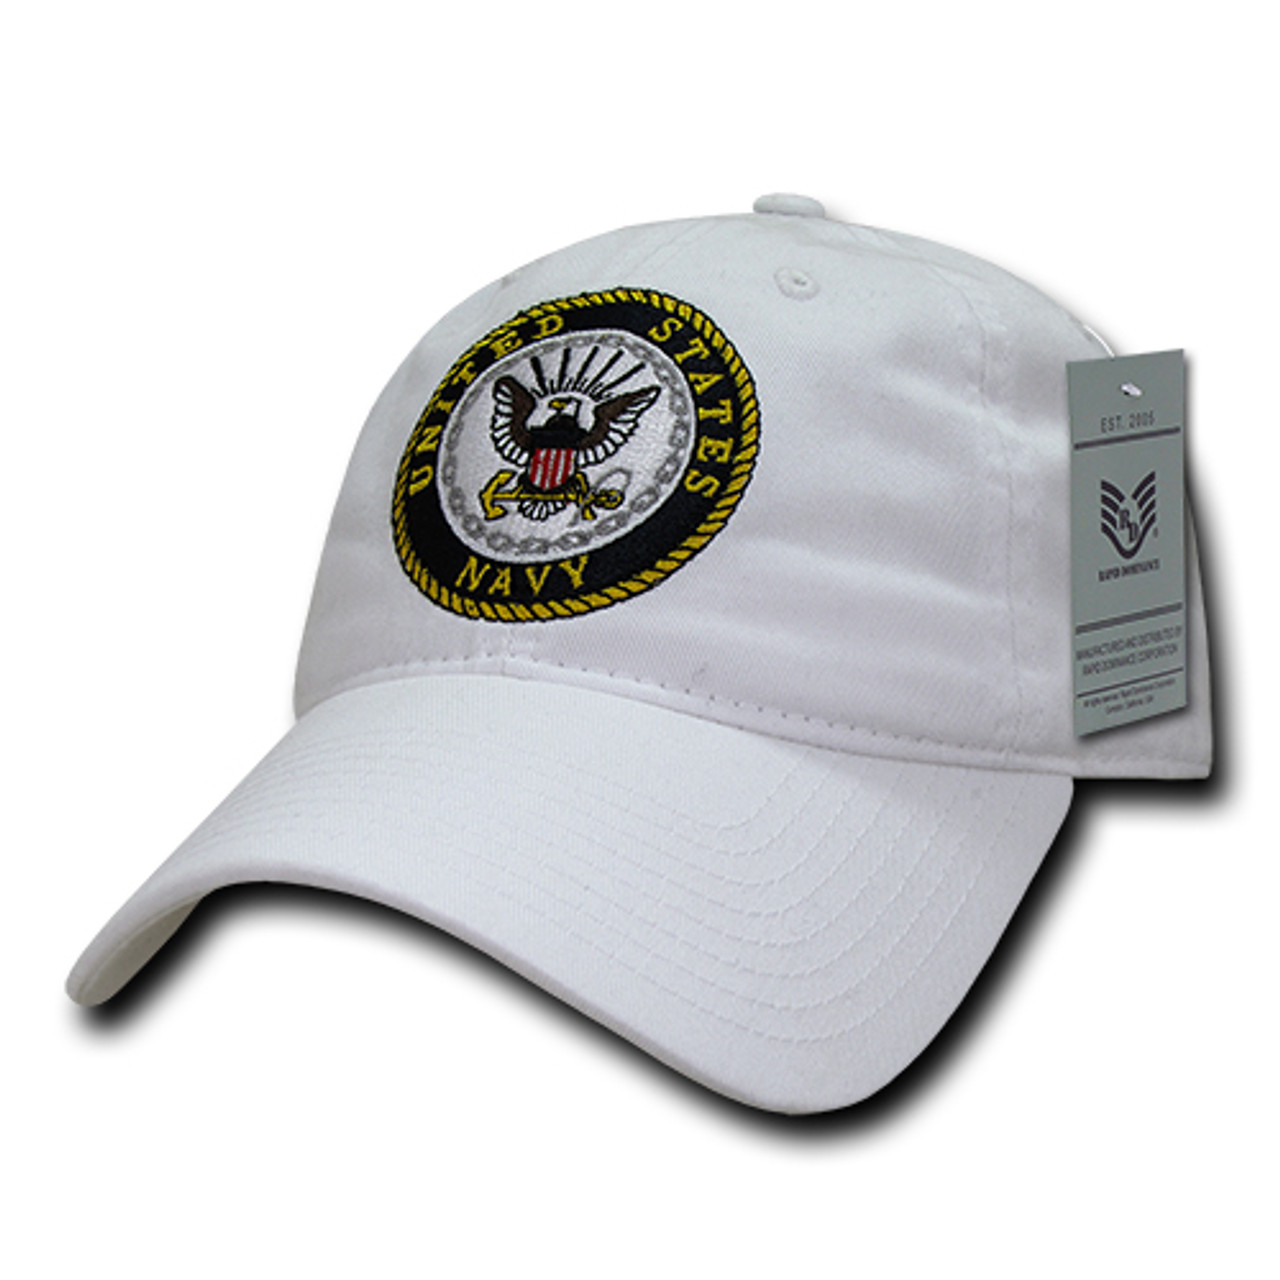 White United States US Navy USA Military Adjustable Baseball Cap Caps Hat Hats